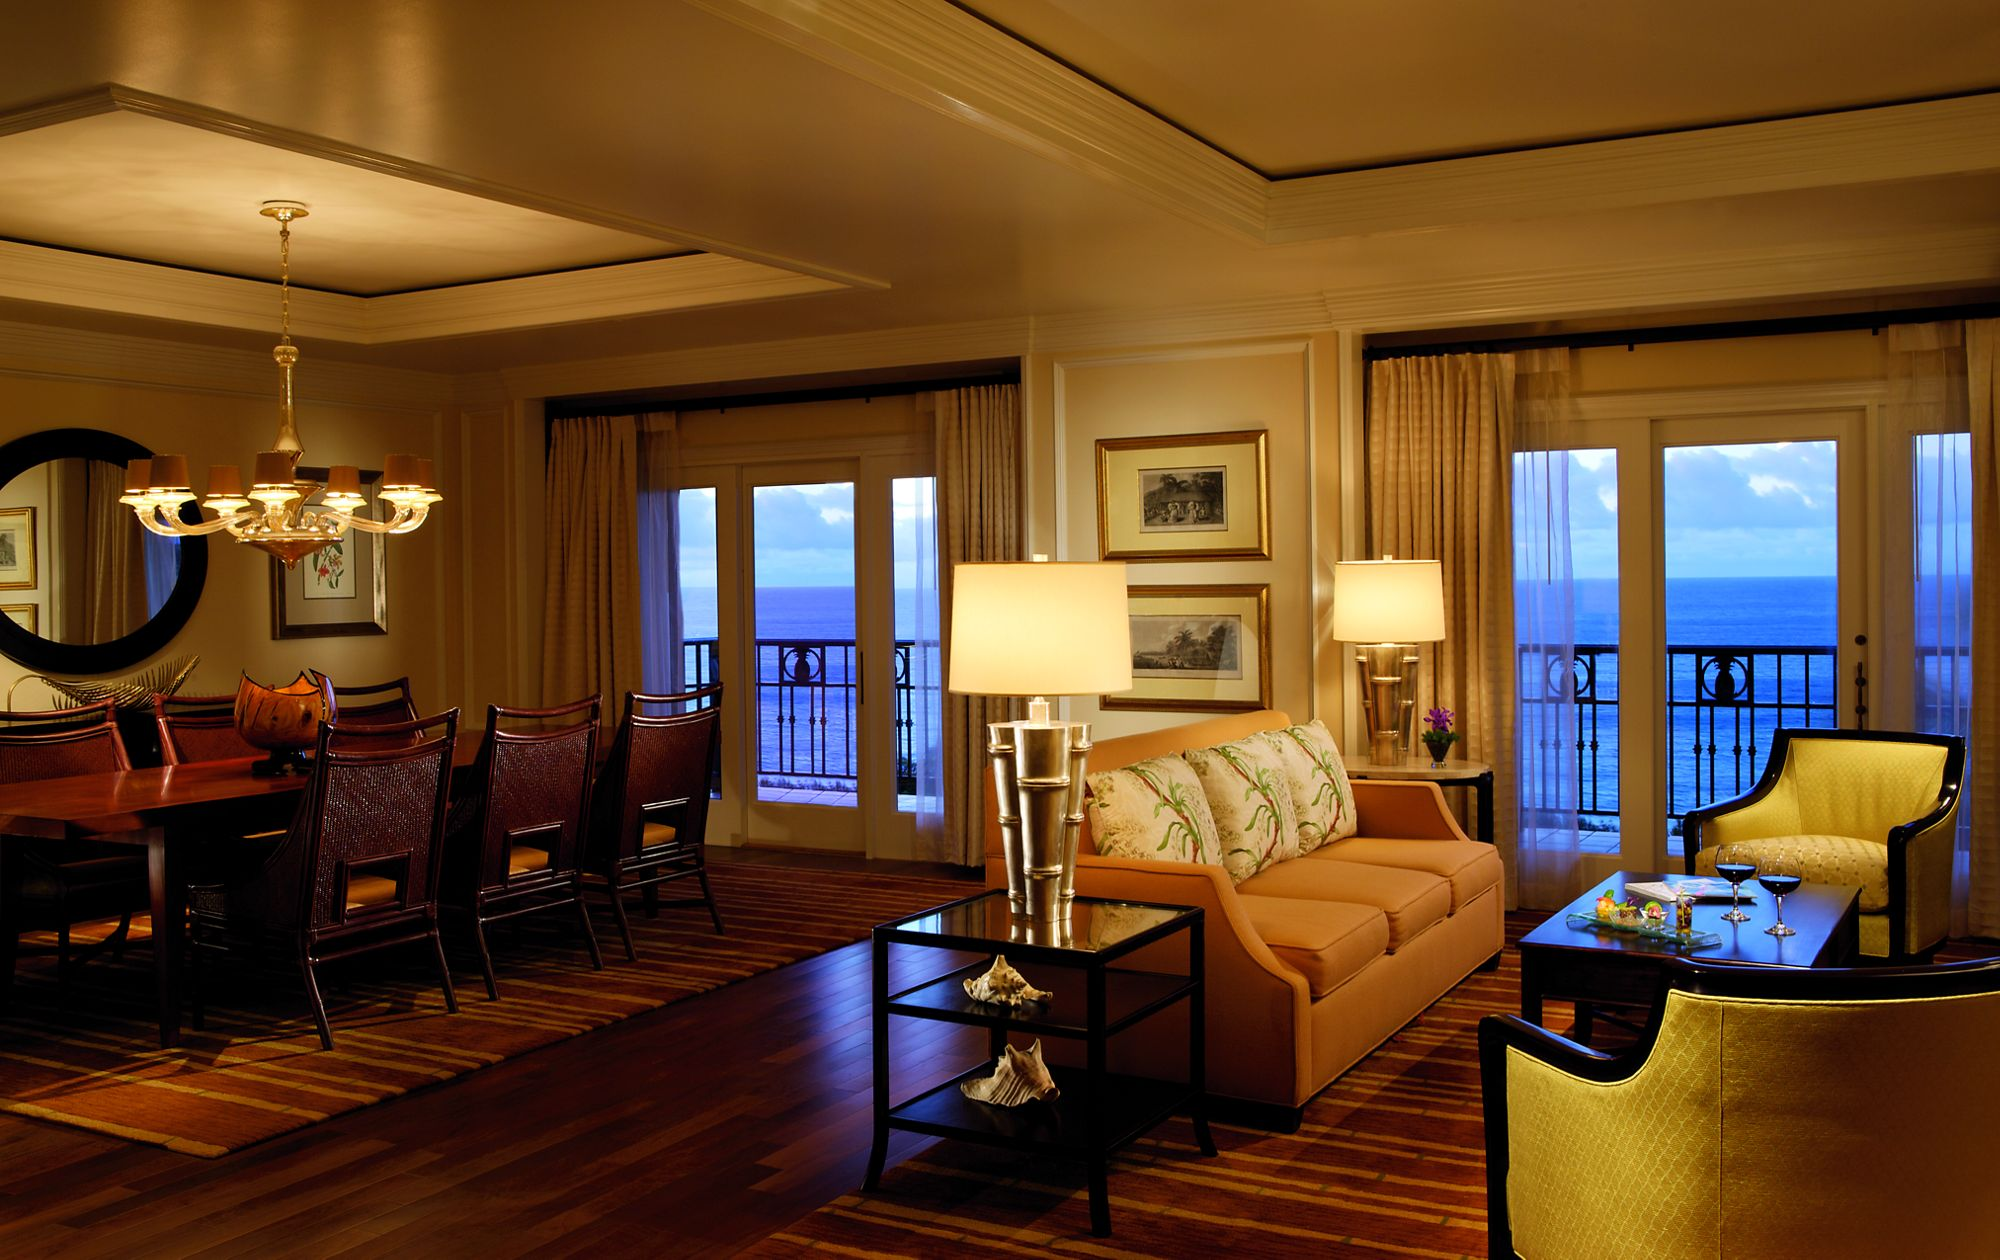 The Ritz-Carlton, Kapalua image 6